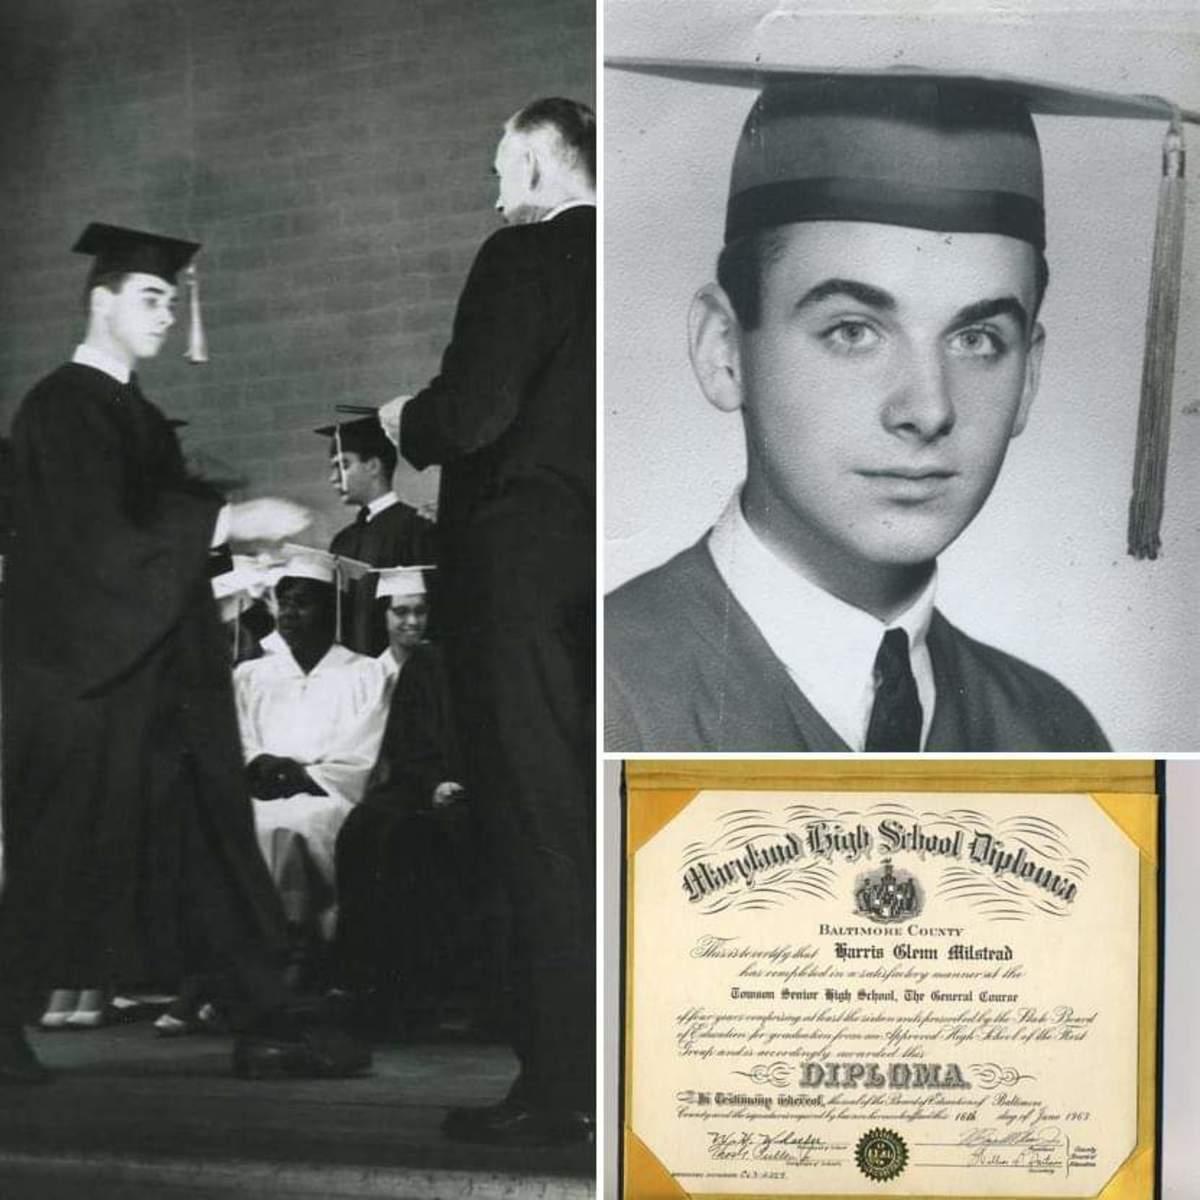 Glenn Harris Milstead's high school graduation